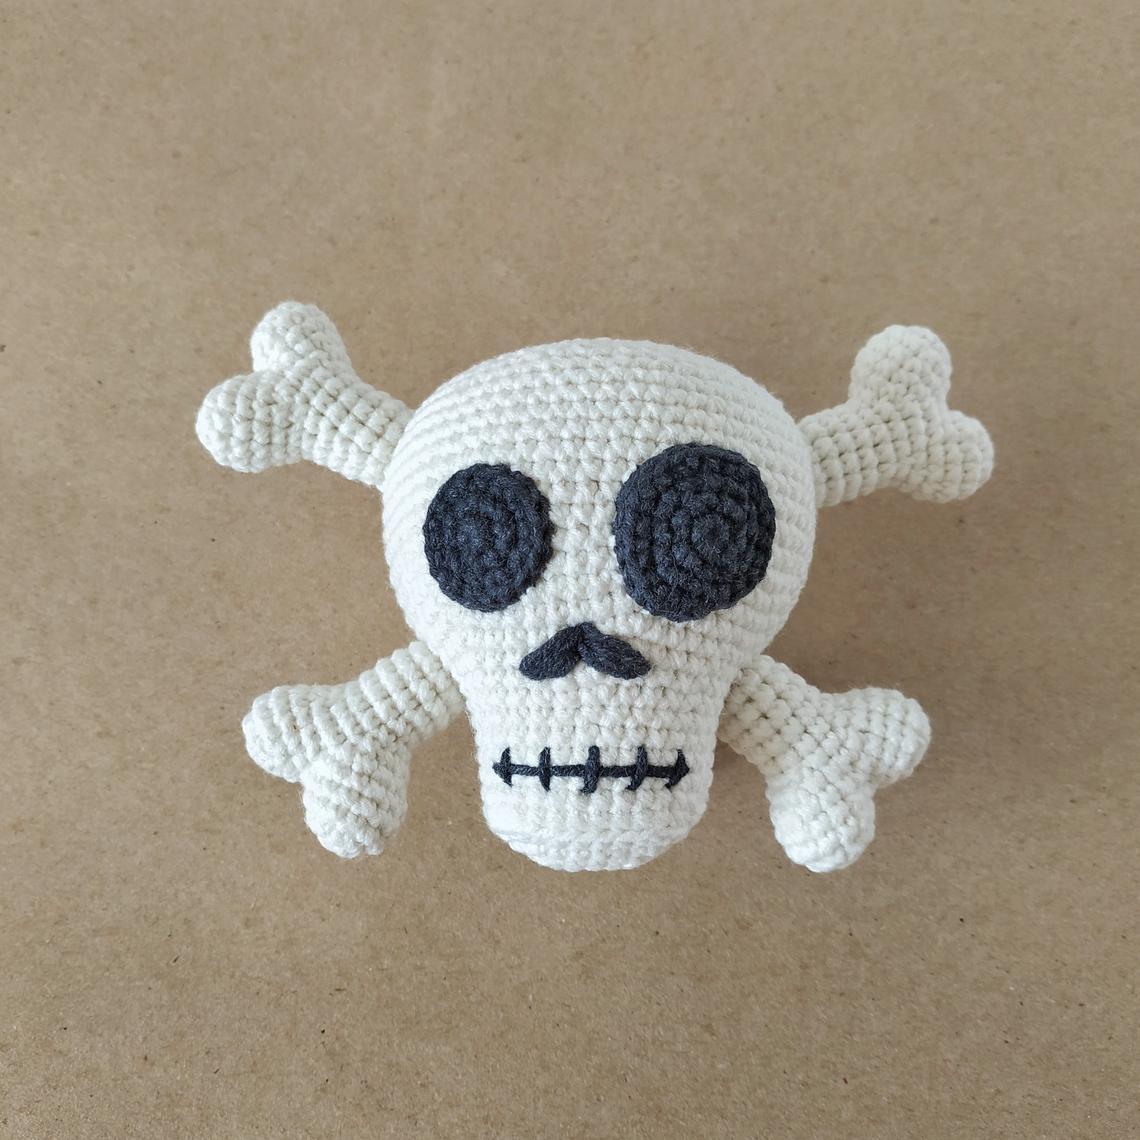 Super Cute Skull & Crossbones Amigurumi ... Fun For Halloween, Cosplay, Gift-Giving!